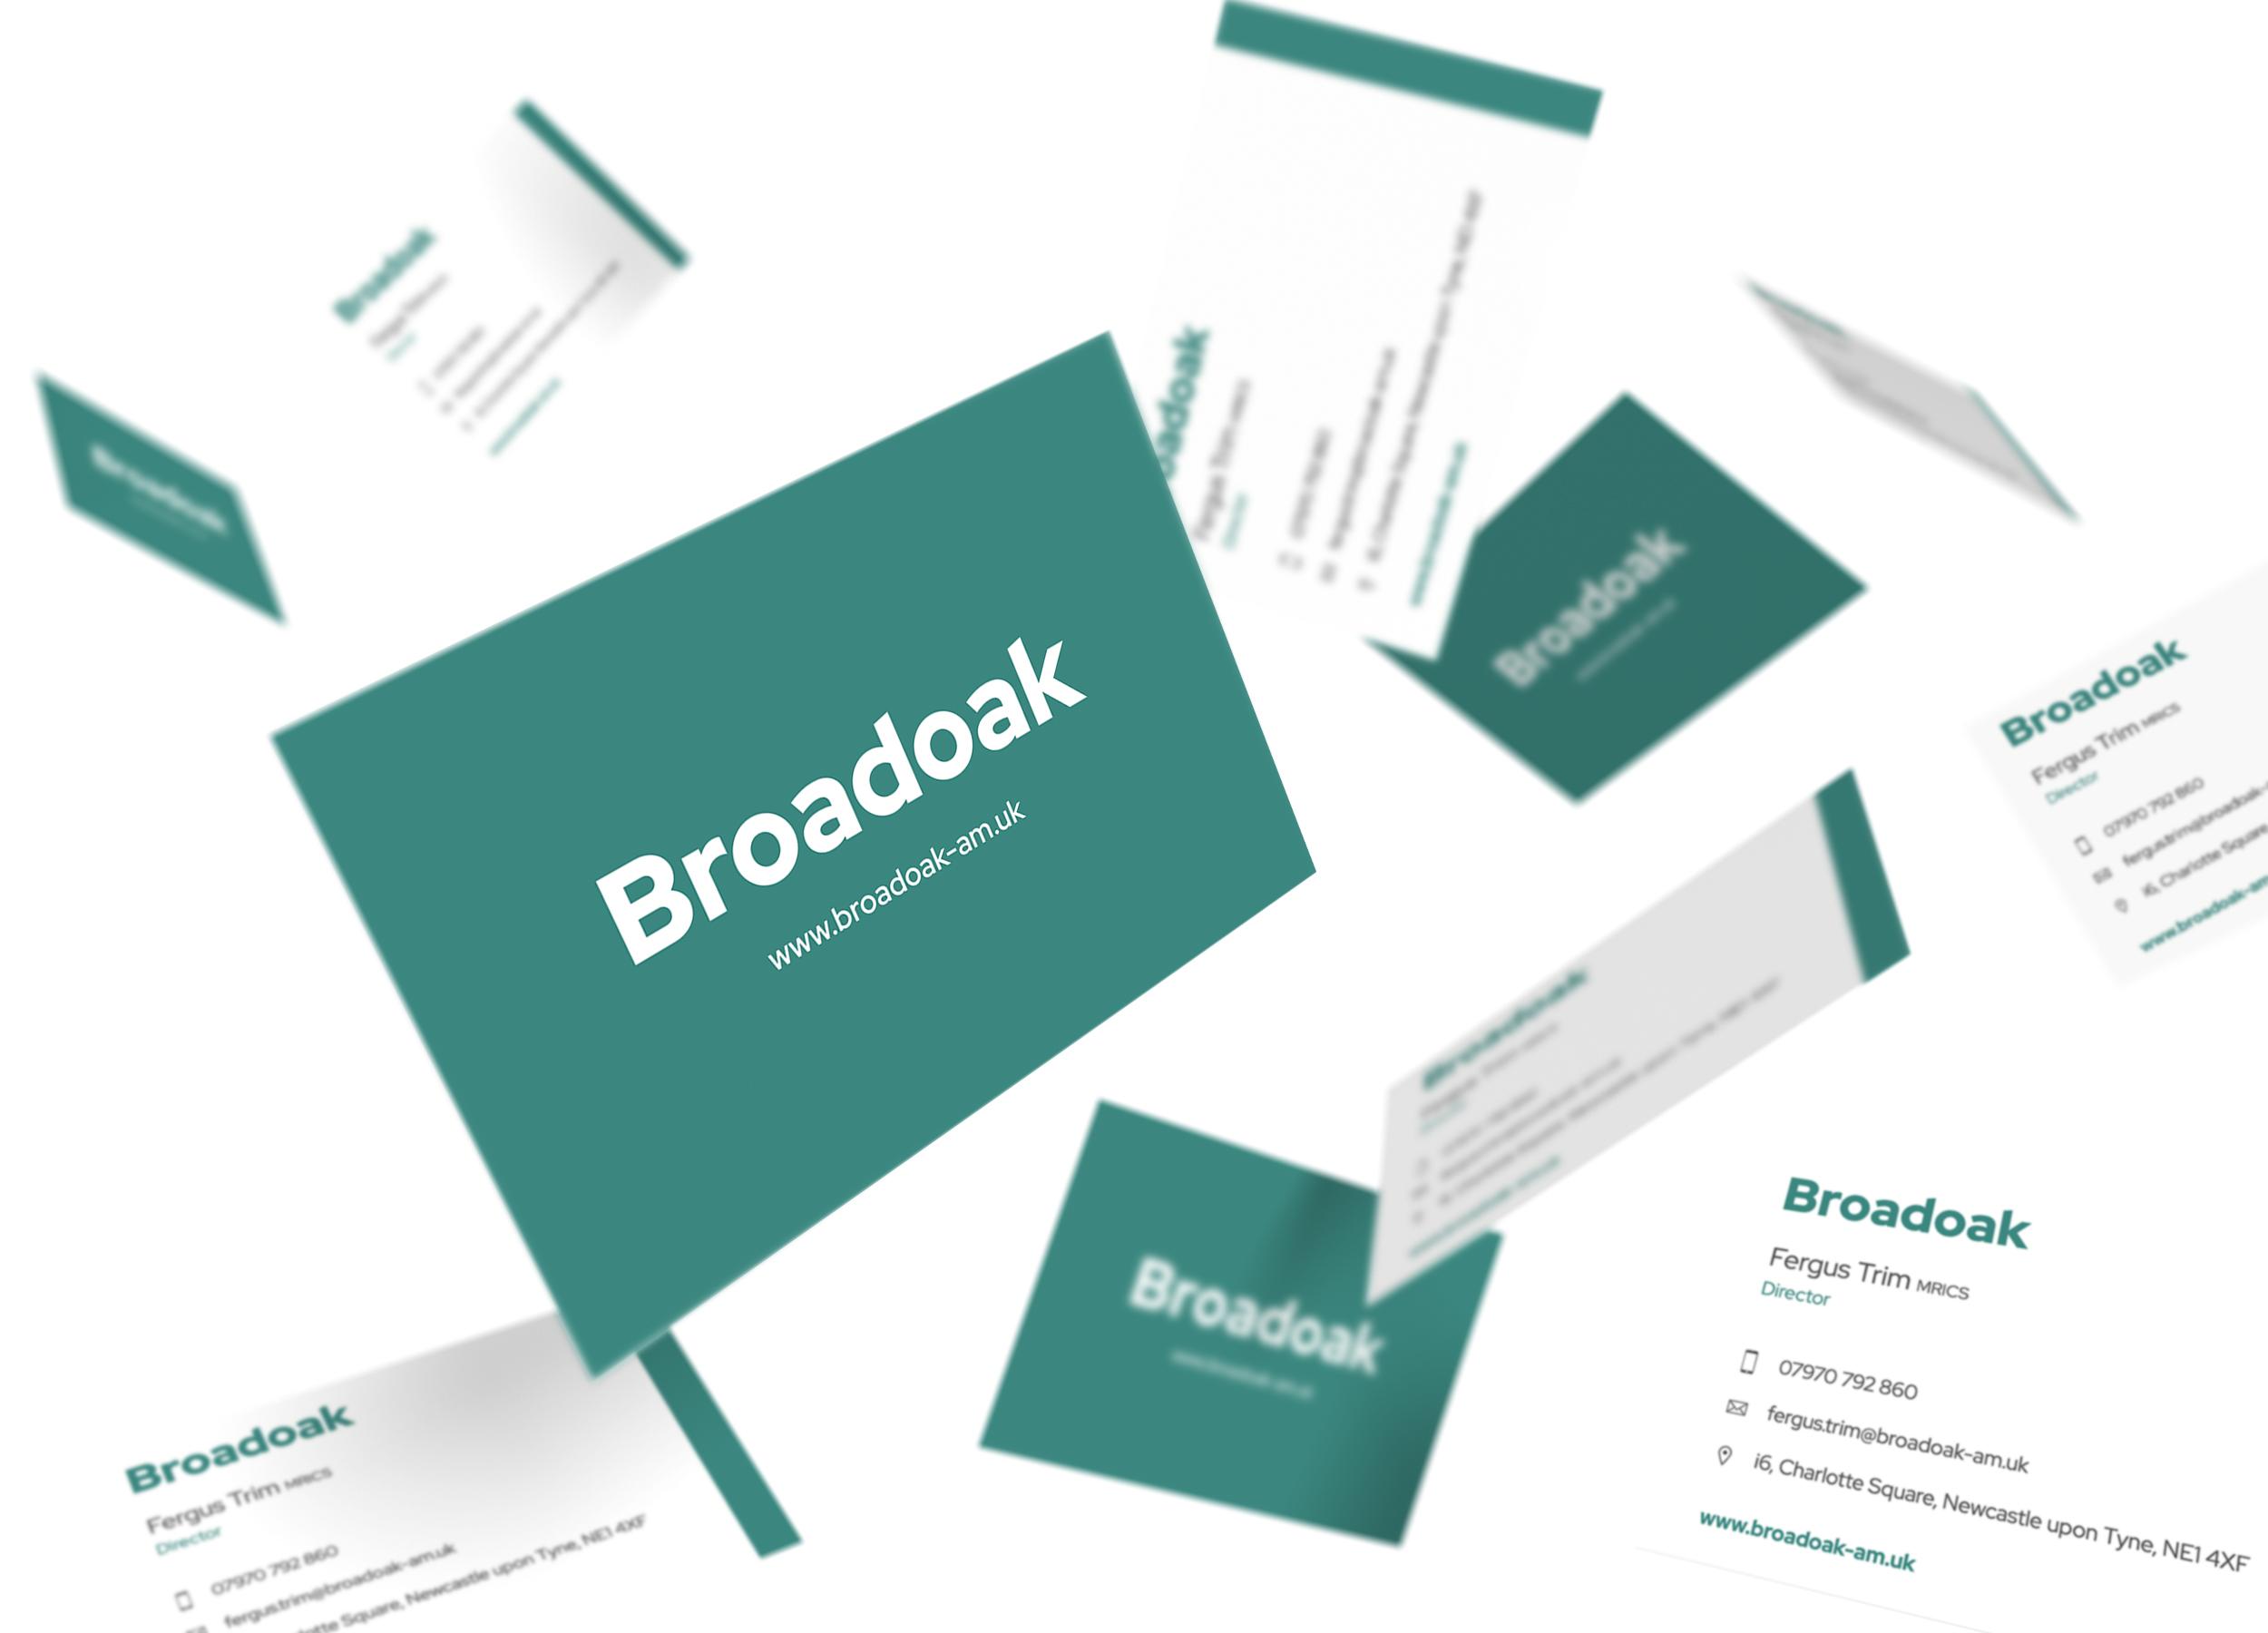 The Evolution of Broadoak's Brand Identity